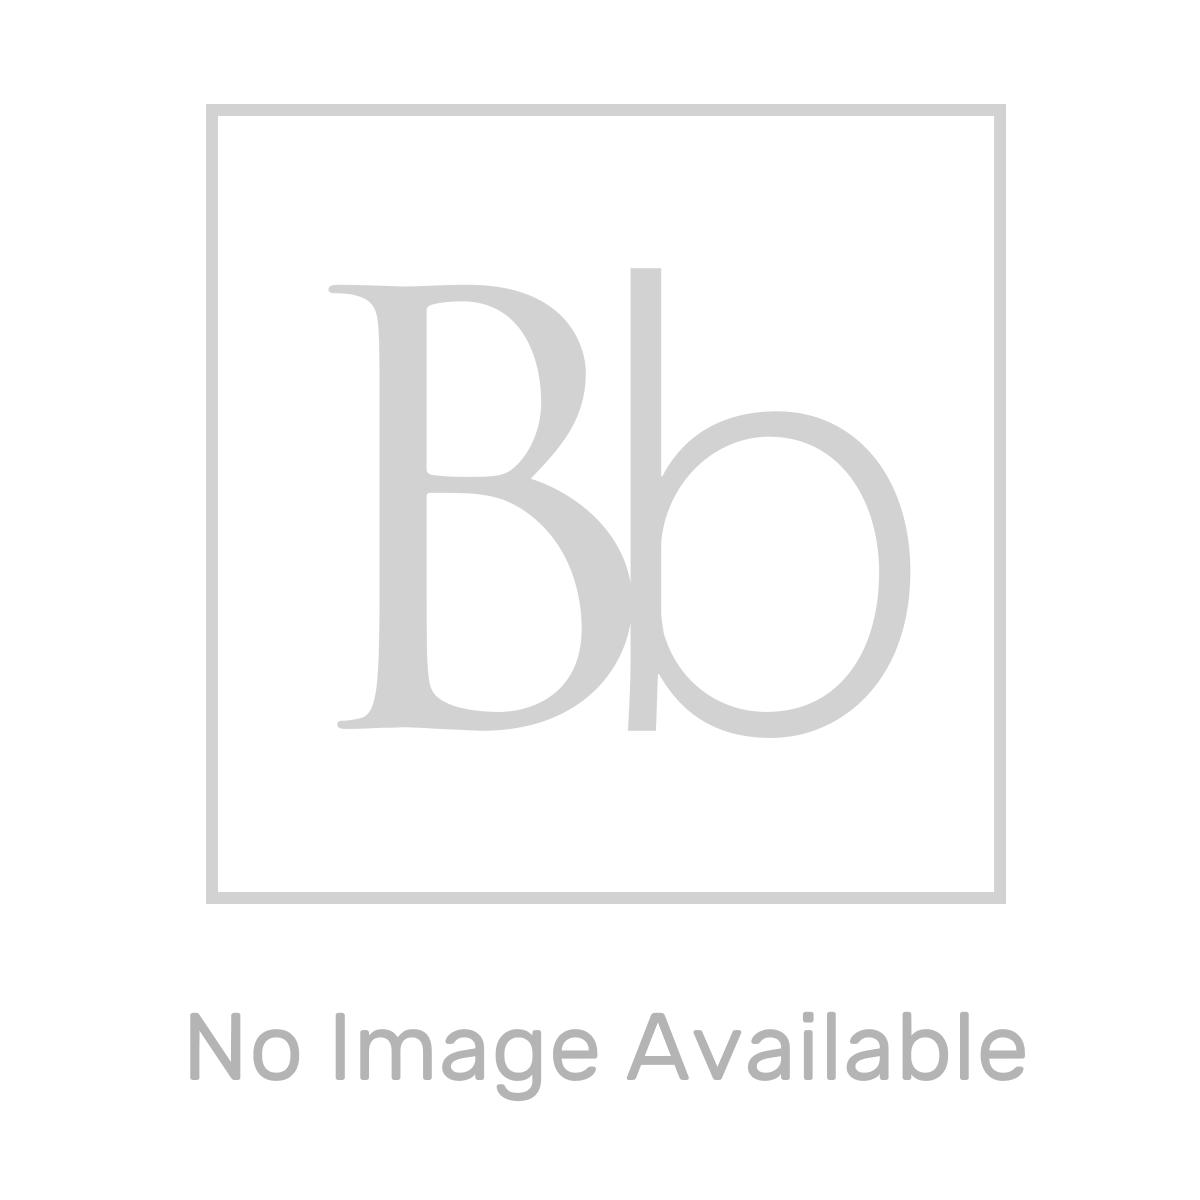 Kartell K-vit White G4K Contract Bath With Leg Set L1700mm W700mm